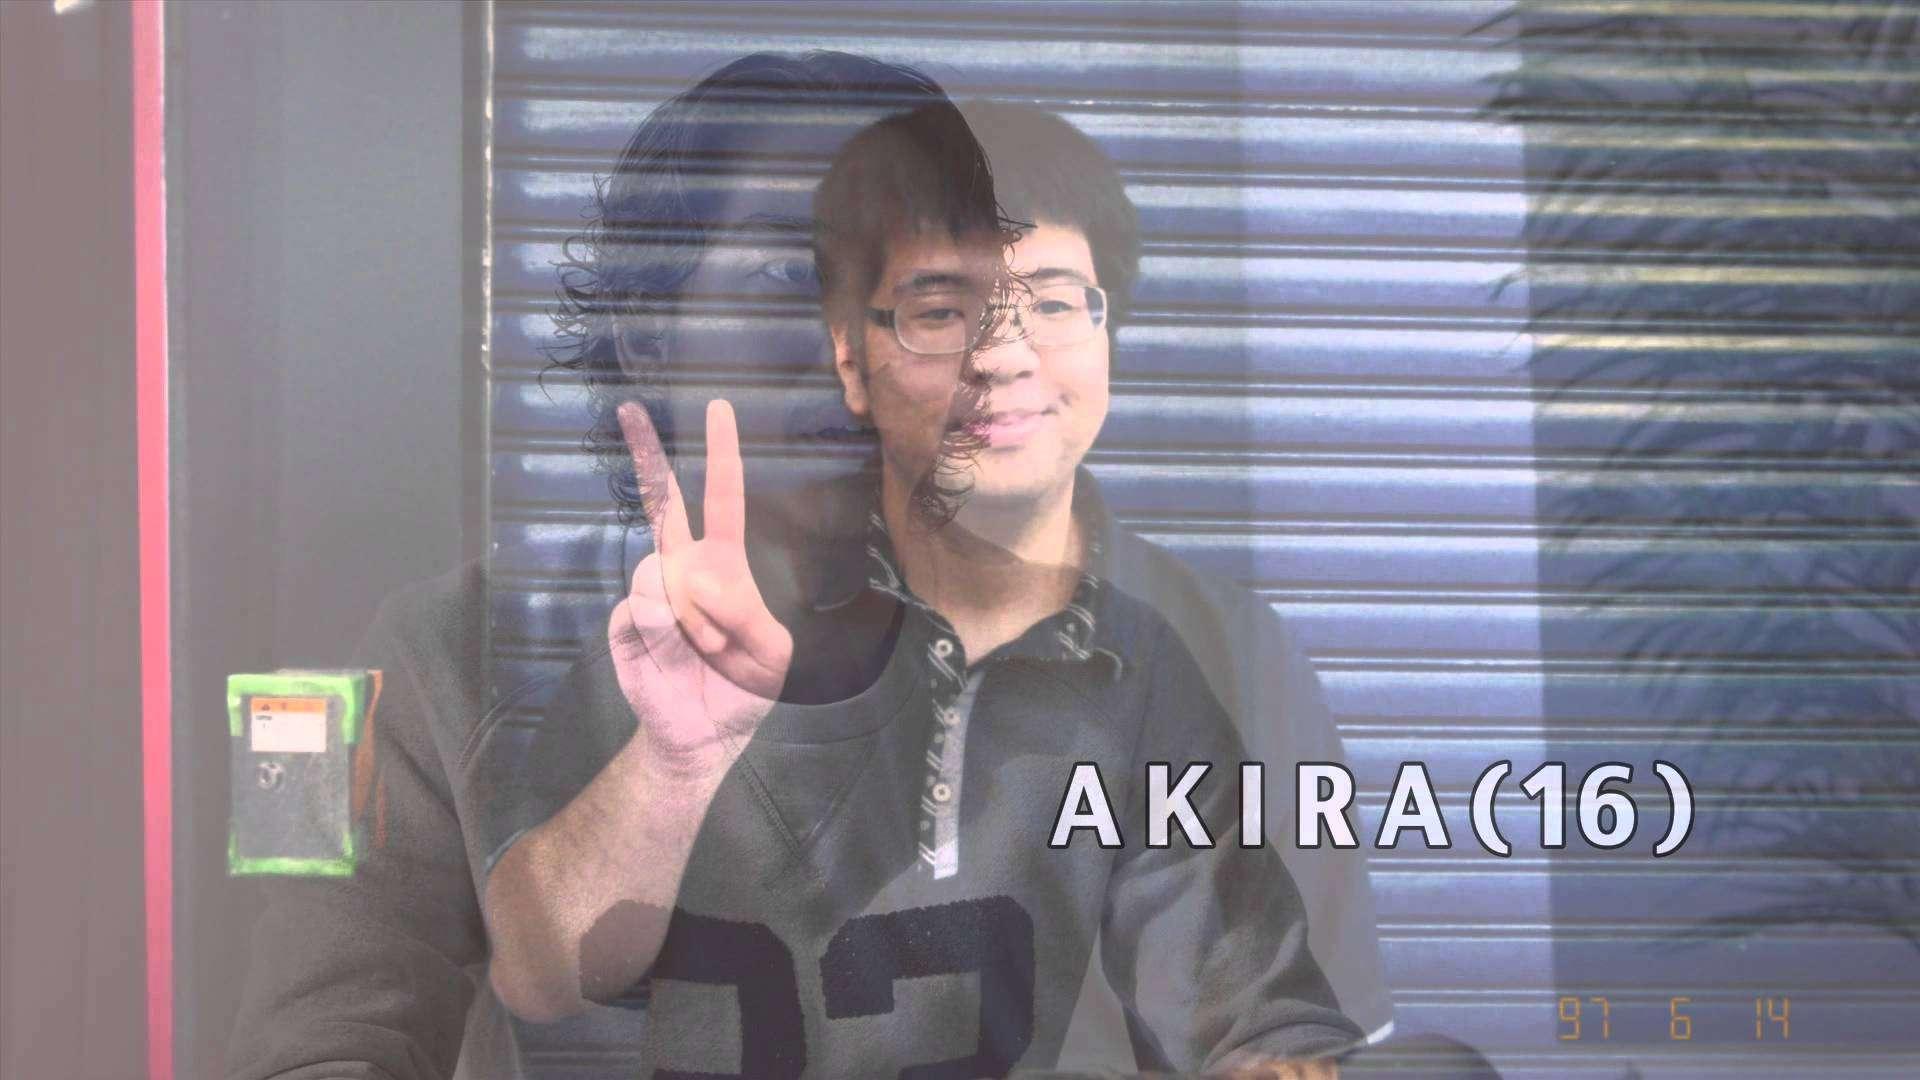 AKIRA (ダンサー)の画像 p1_34